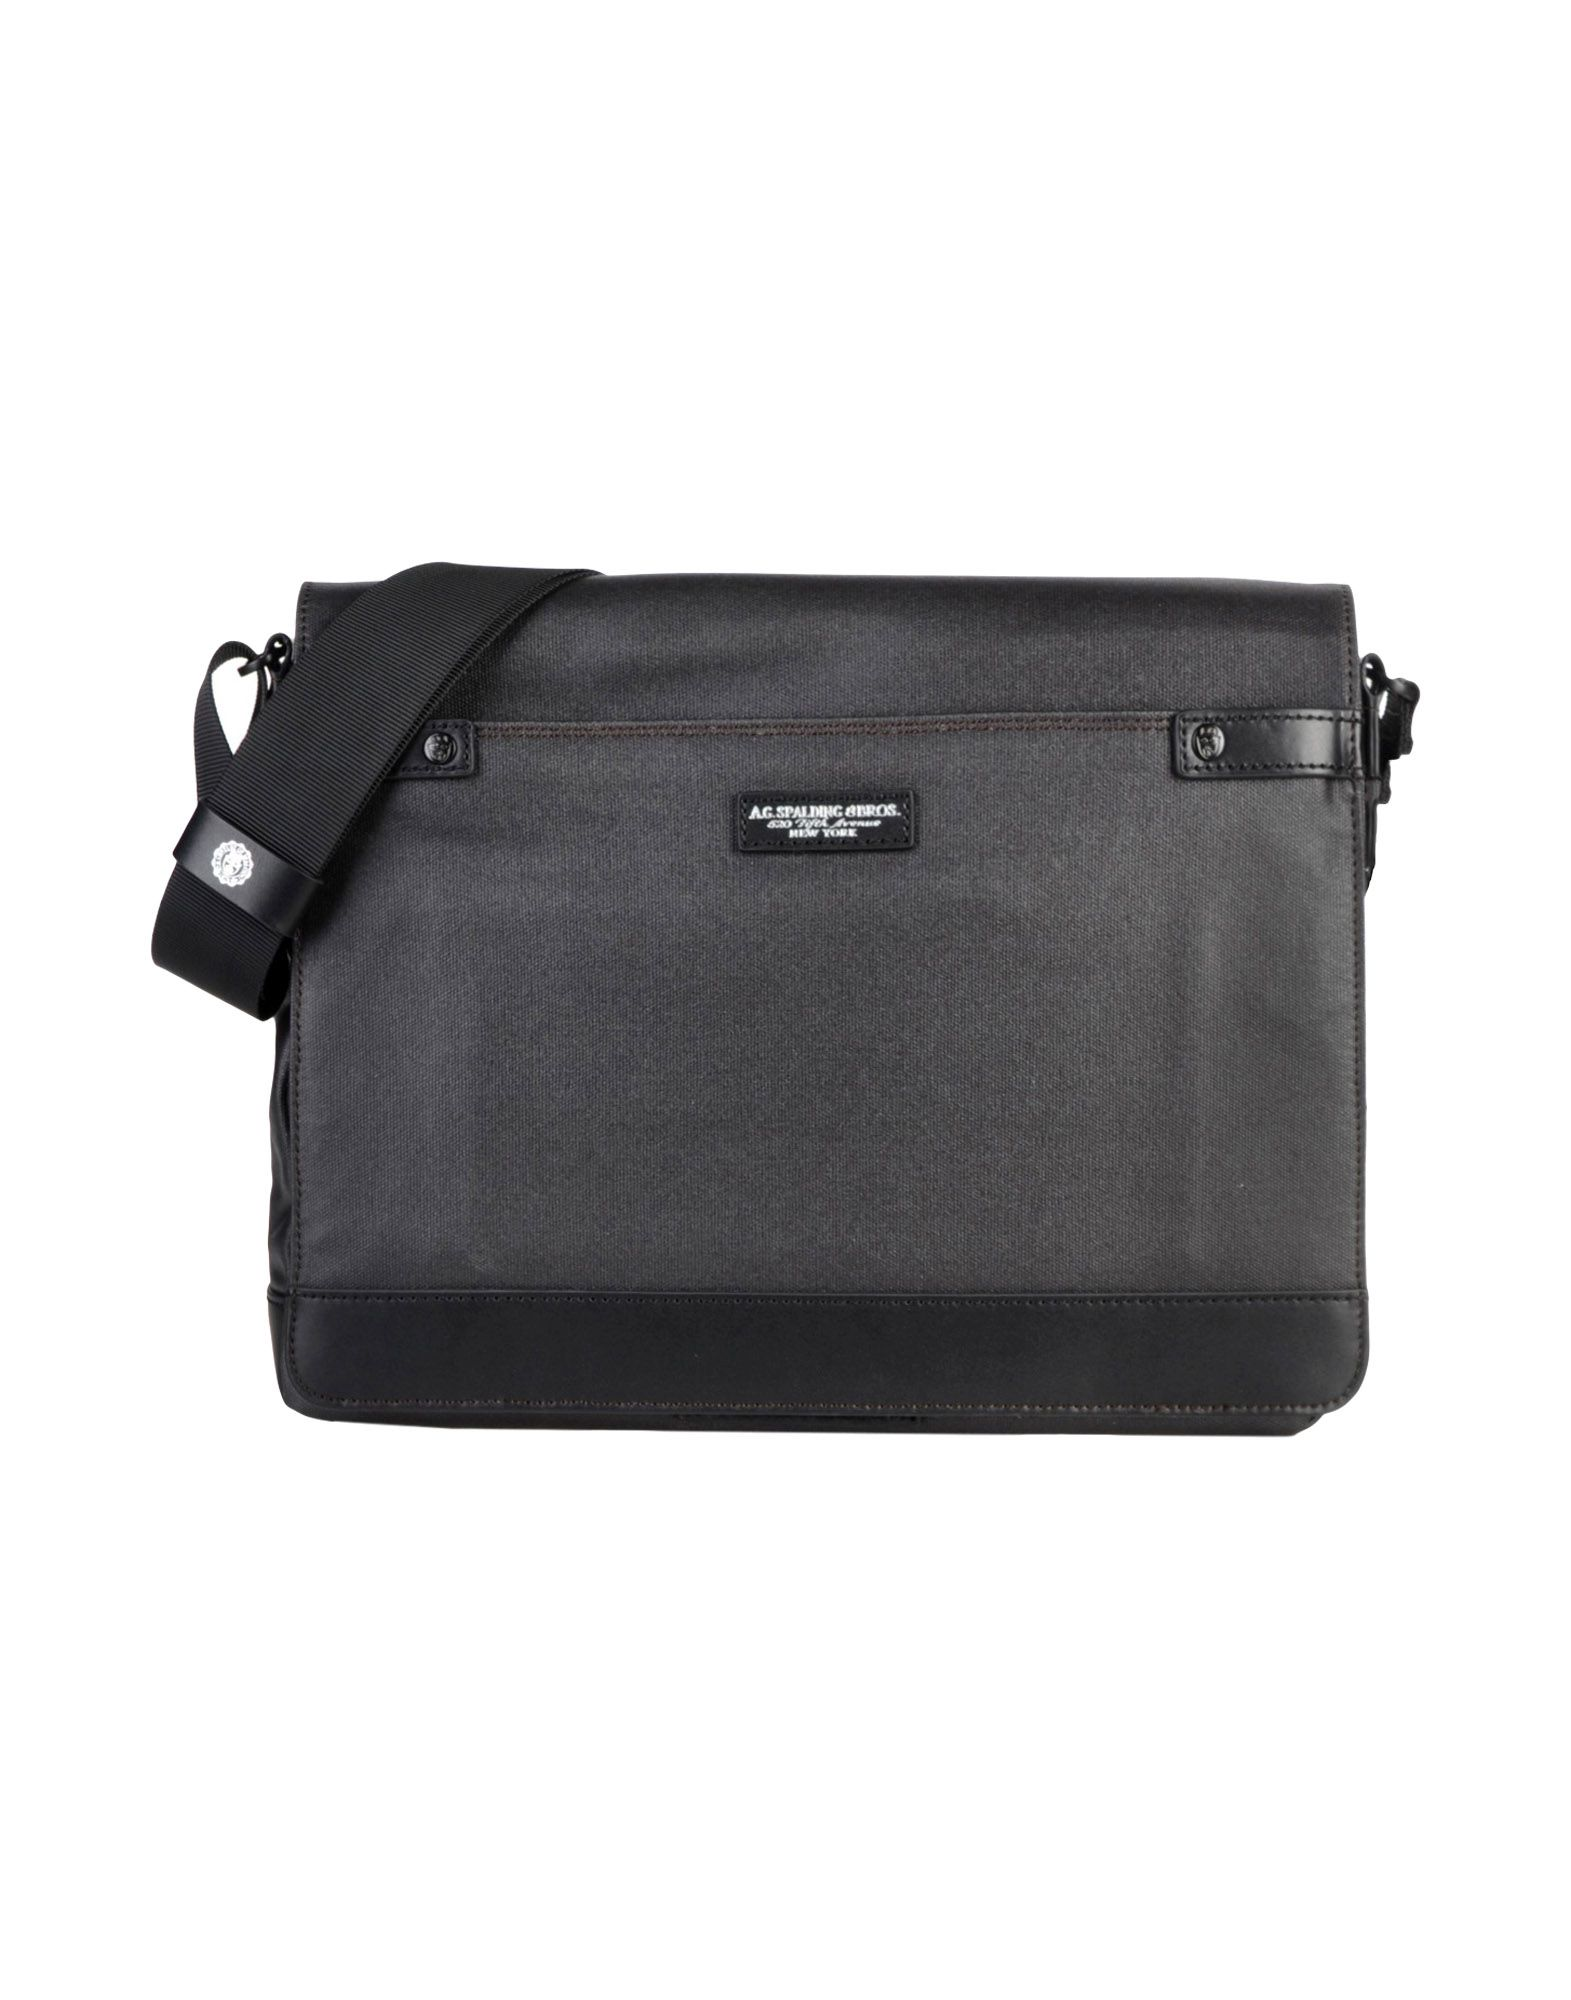 A.G. SPALDING & BROS. 520 FIFTH AVENUE New York Деловые сумки